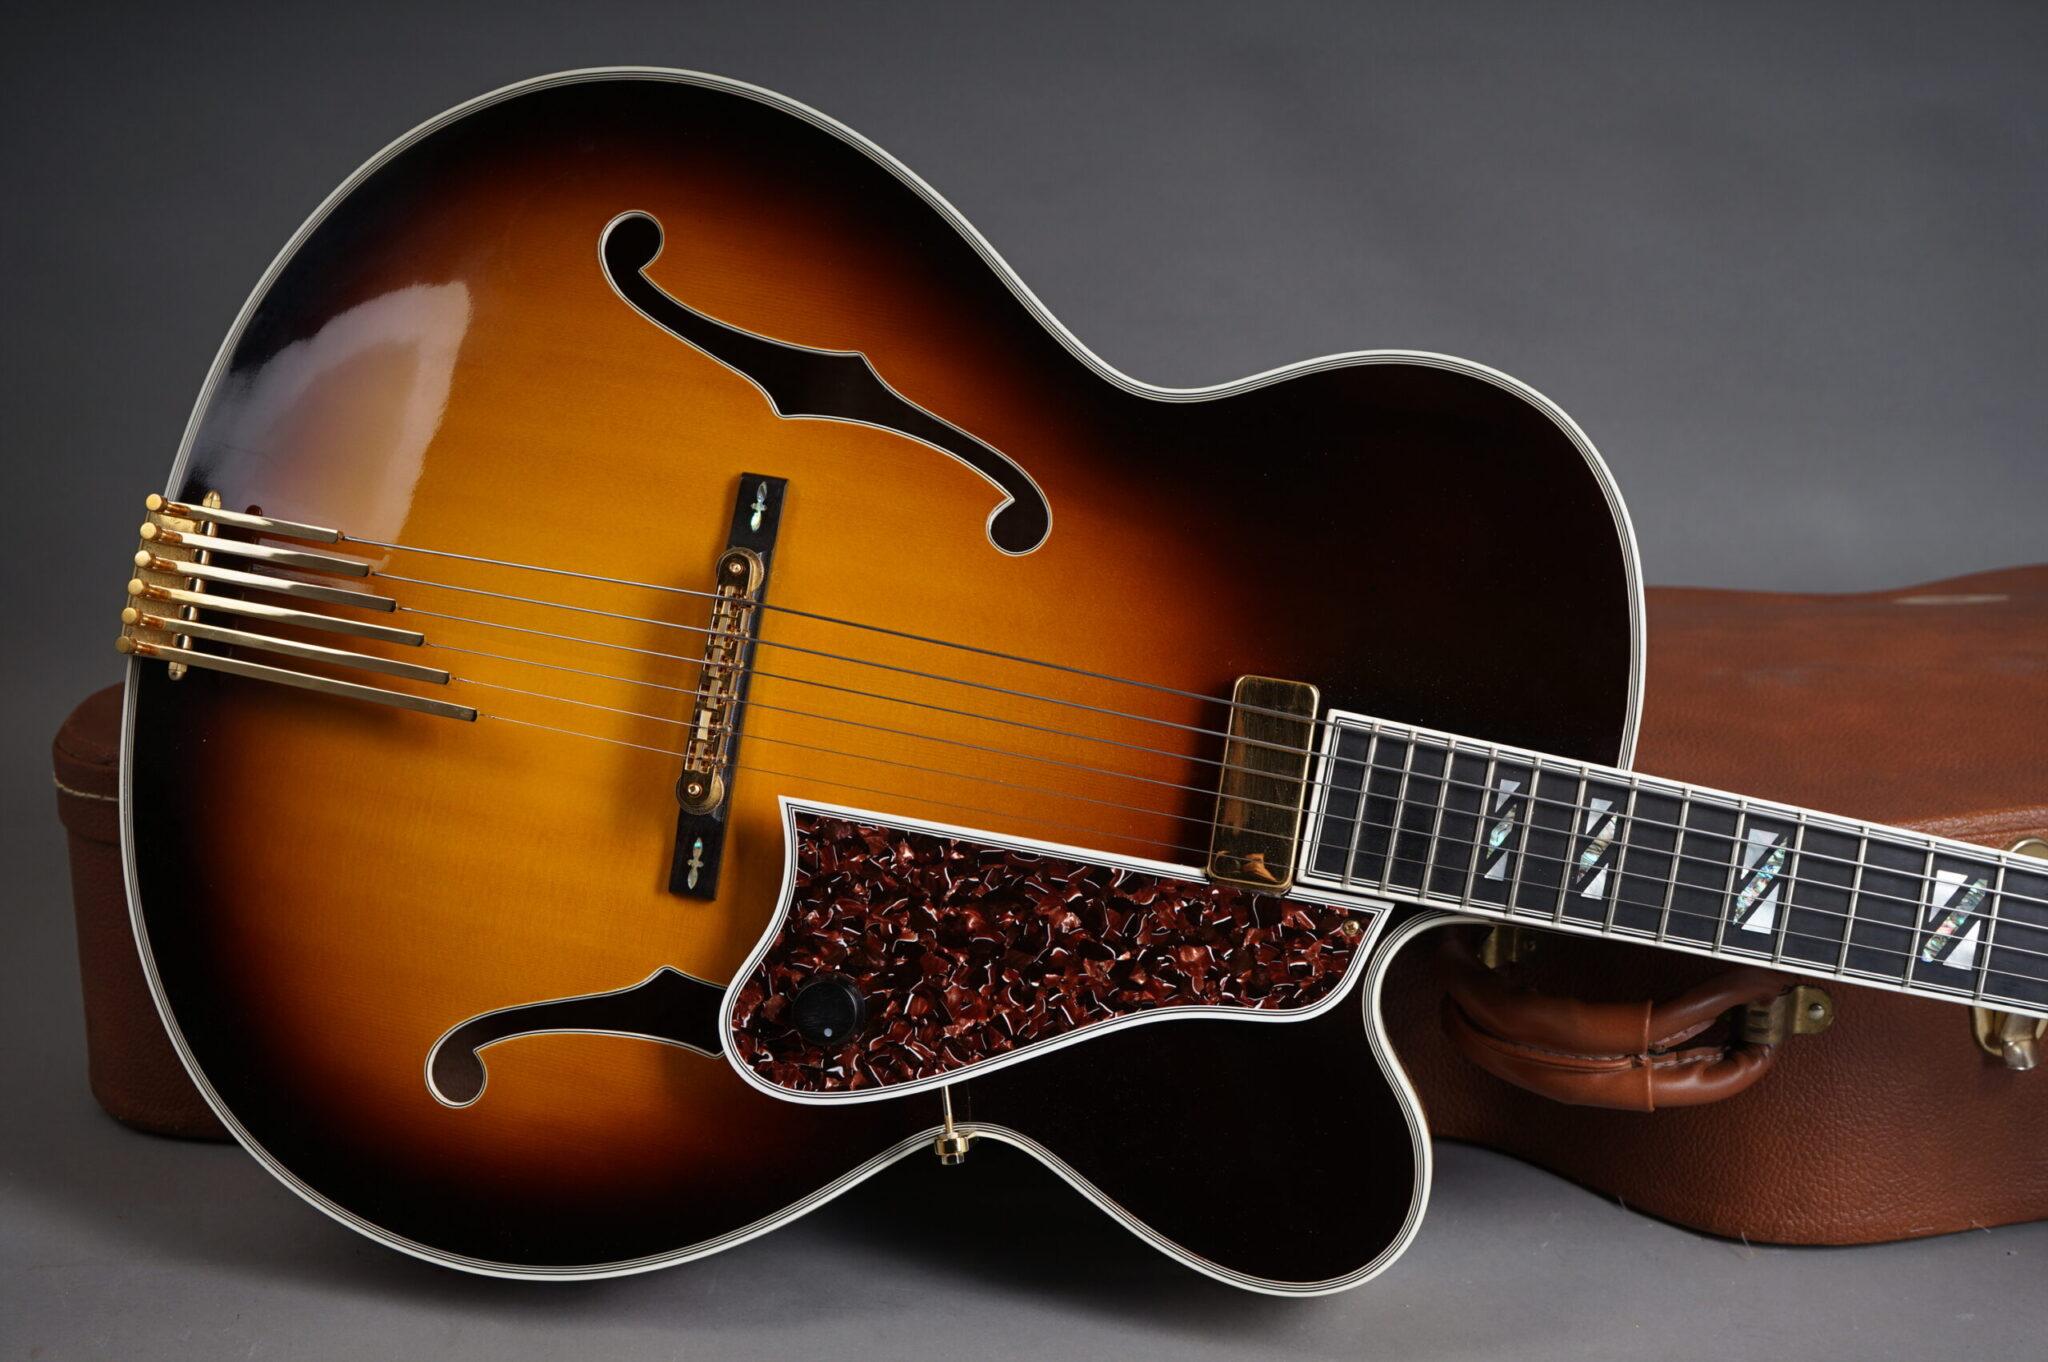 https://guitarpoint.de/app/uploads/products/2003-gibson-custom-shop-le-grand-sunburst/2003-Gibson-LeGrand-Sunburst-21665005-9-scaled-2048x1362.jpg